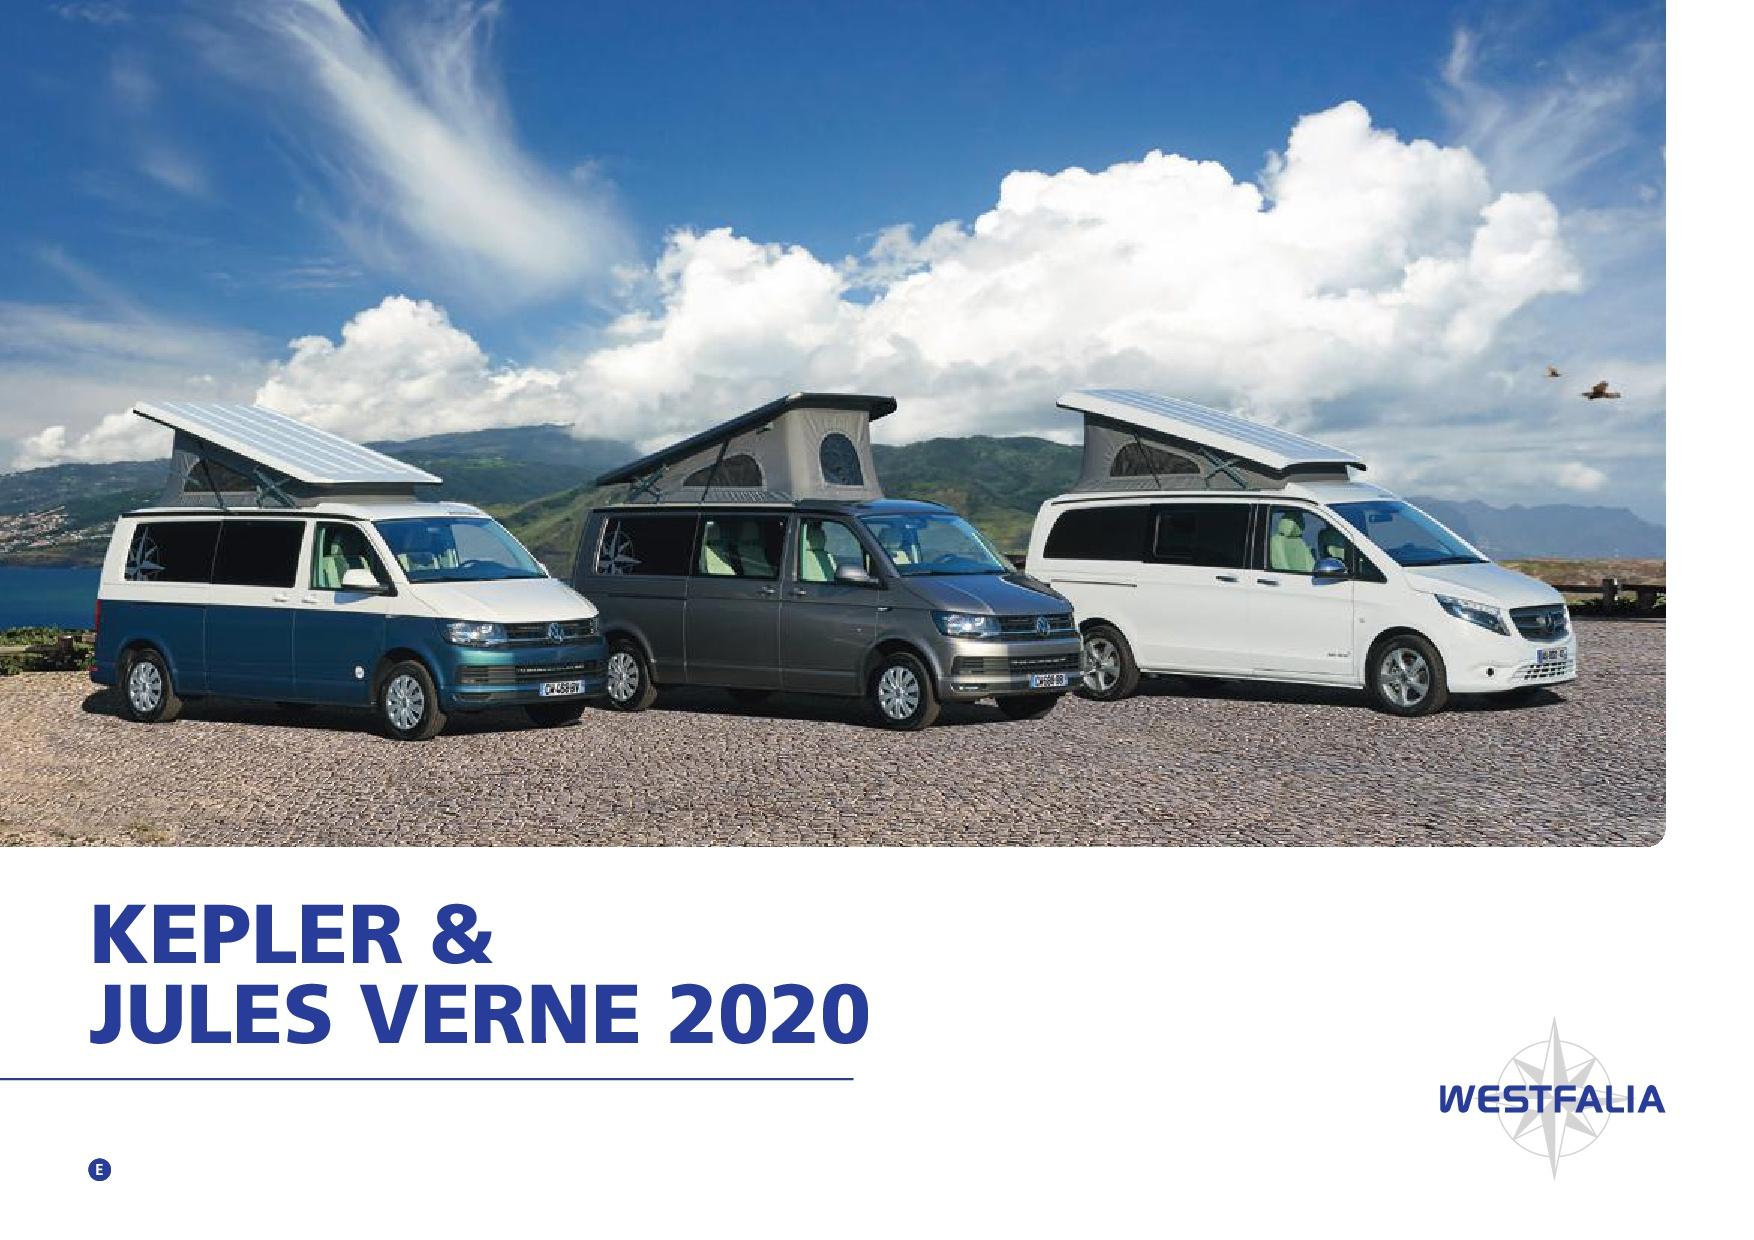 2020 Westfalia Kepler & Jules Verne Brochure